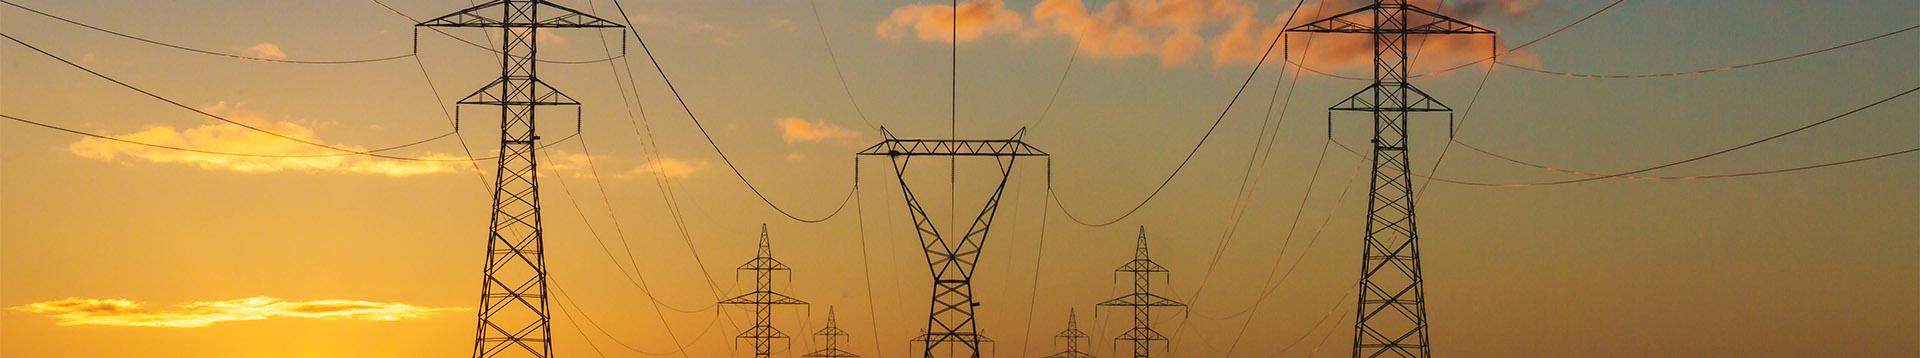 banner-industry-energy